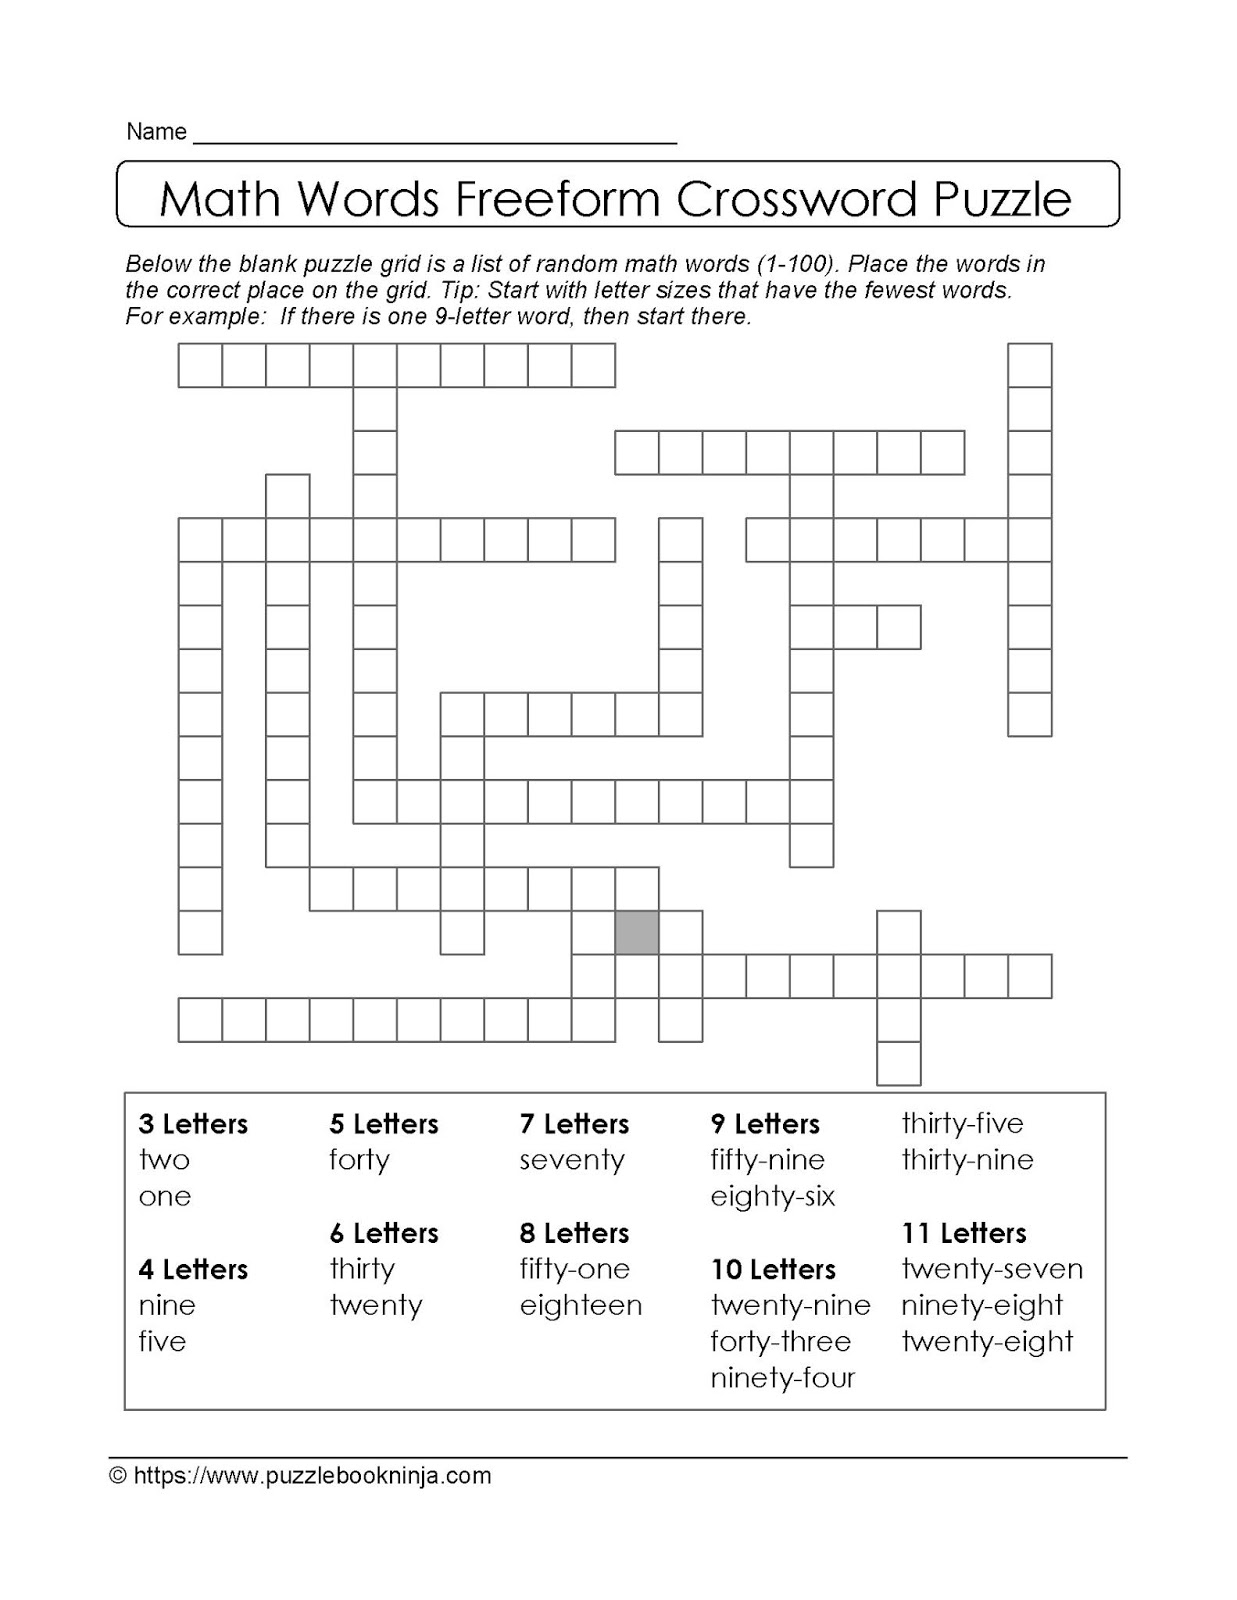 Crossword Fill In 01 Answers